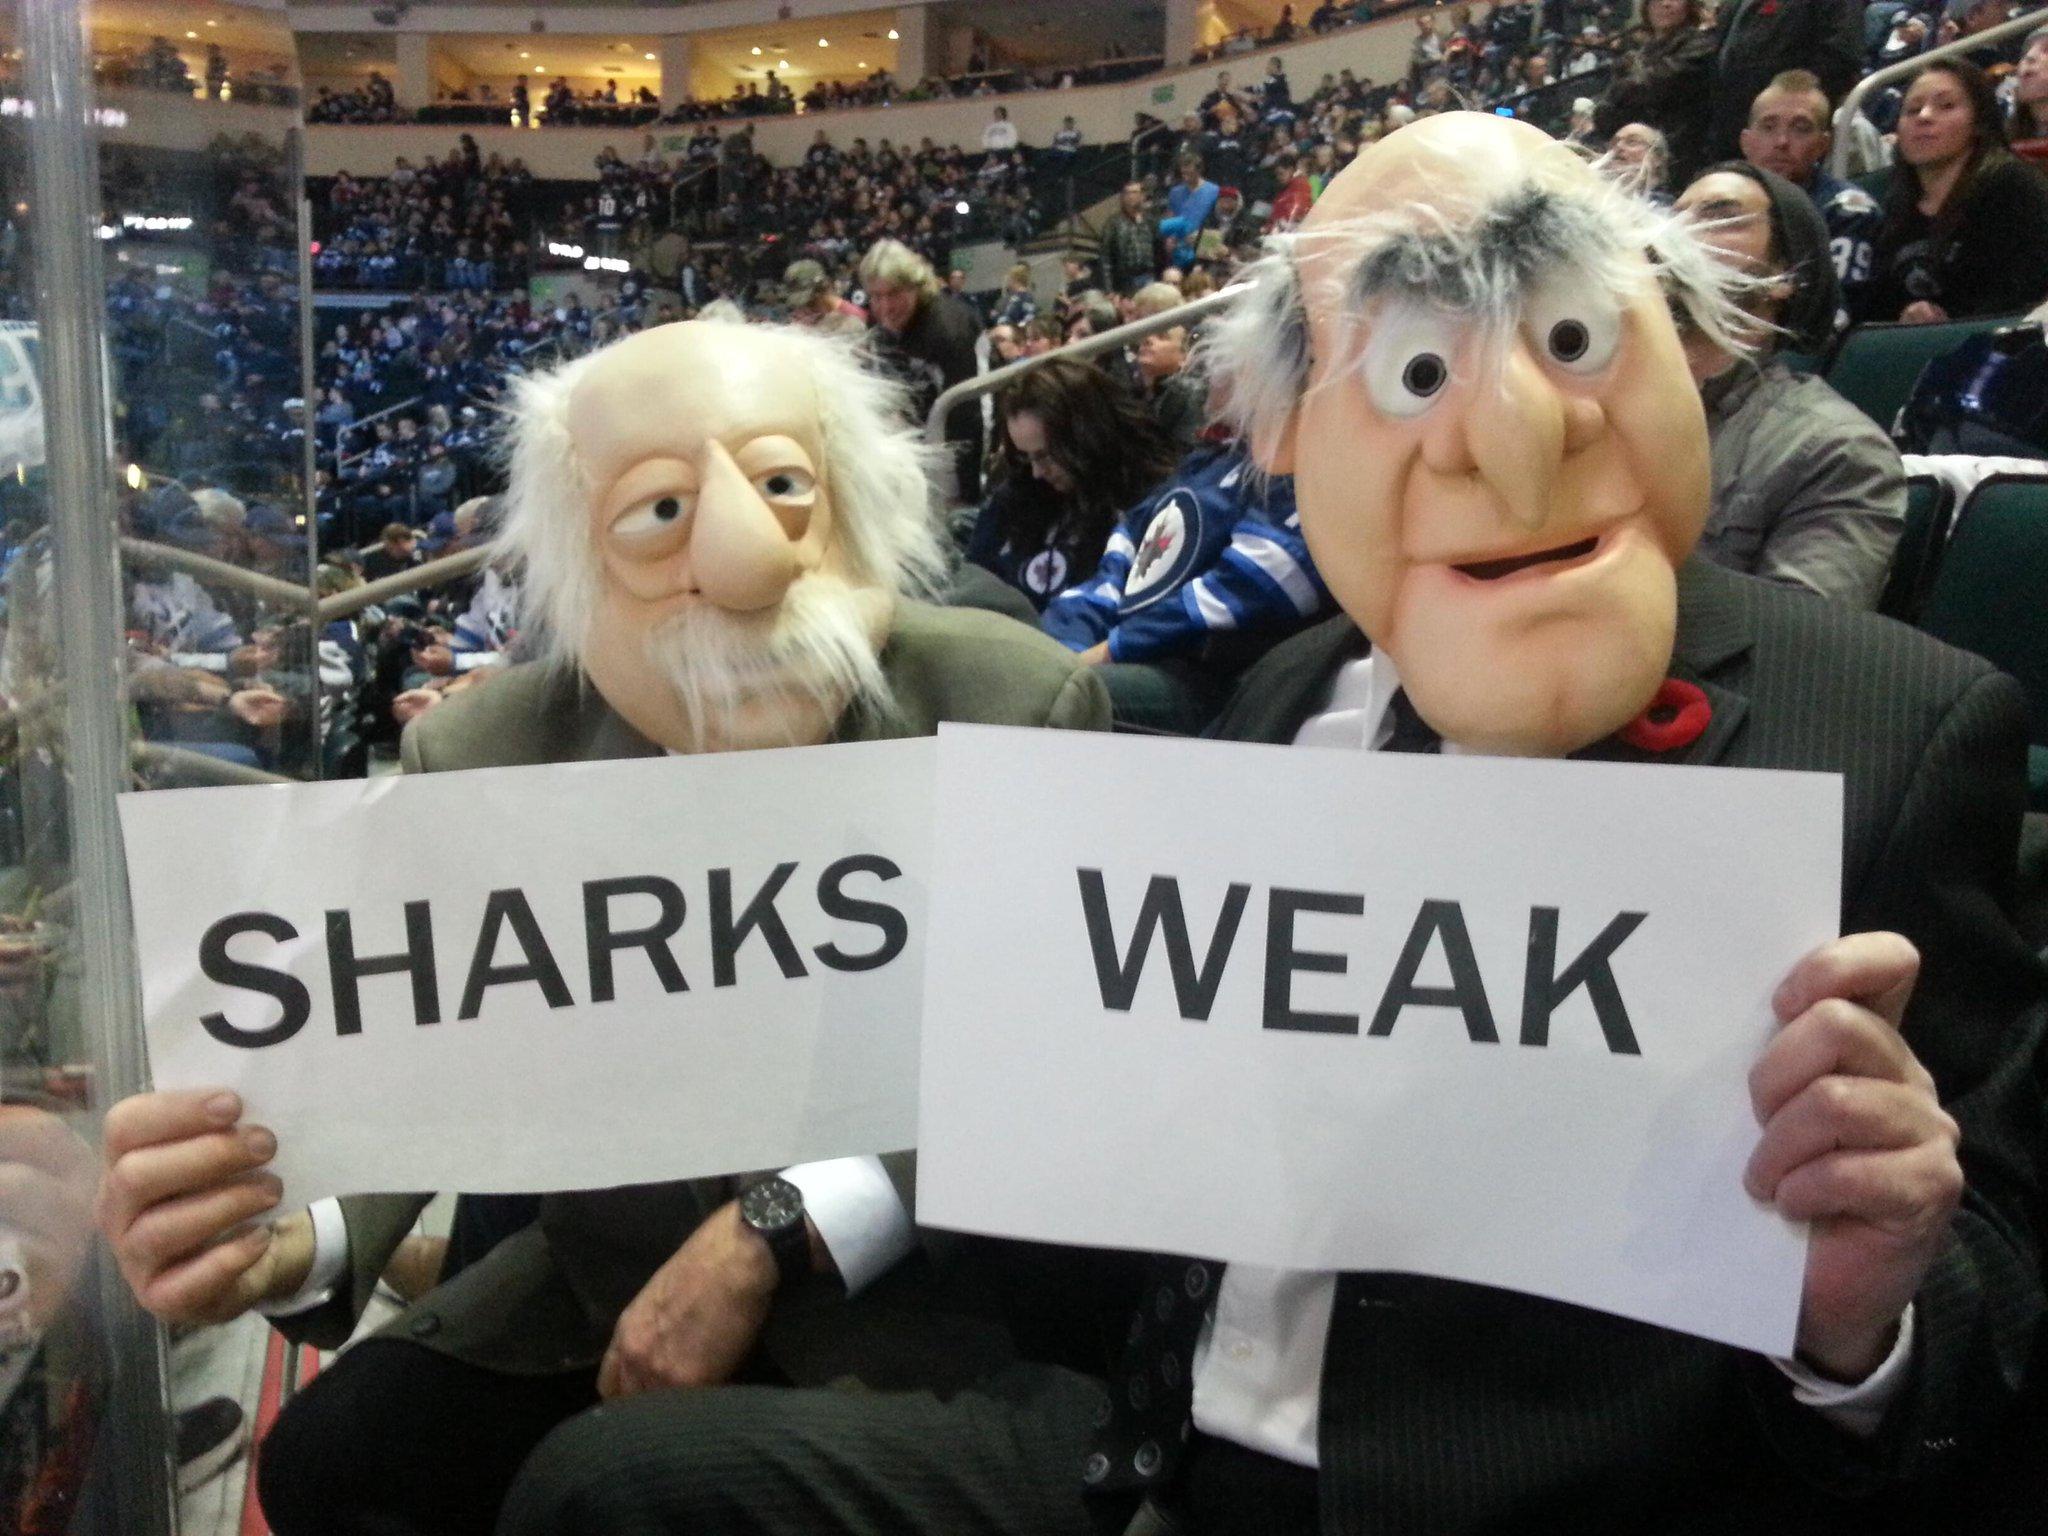 "RT @StatsandWaldorf: @dmazur20 RT @ValParker7: @StatsandWaldorf say: ""Sharks Weak!"" RT and get the word out. #GoJetsGo http://t.co/kQ31UdeLnv"